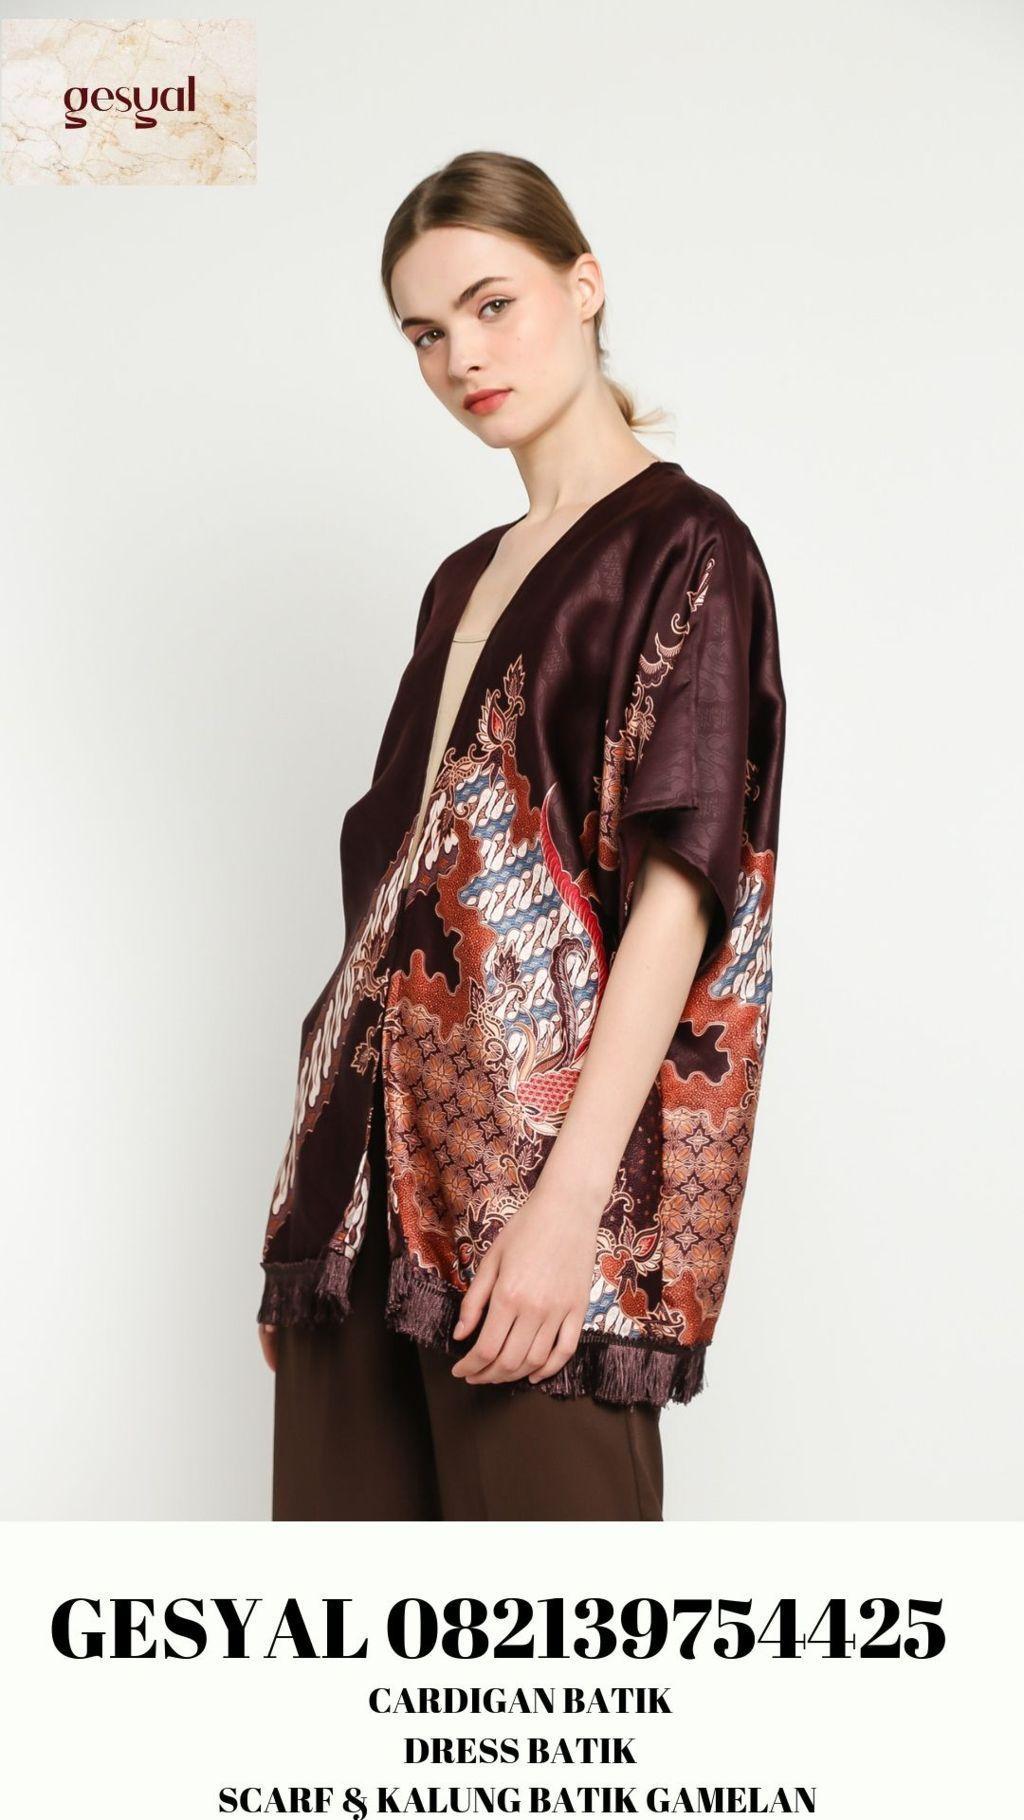 Baju Batik Wanita Surabaya Baju Batik Wanita Surakarta